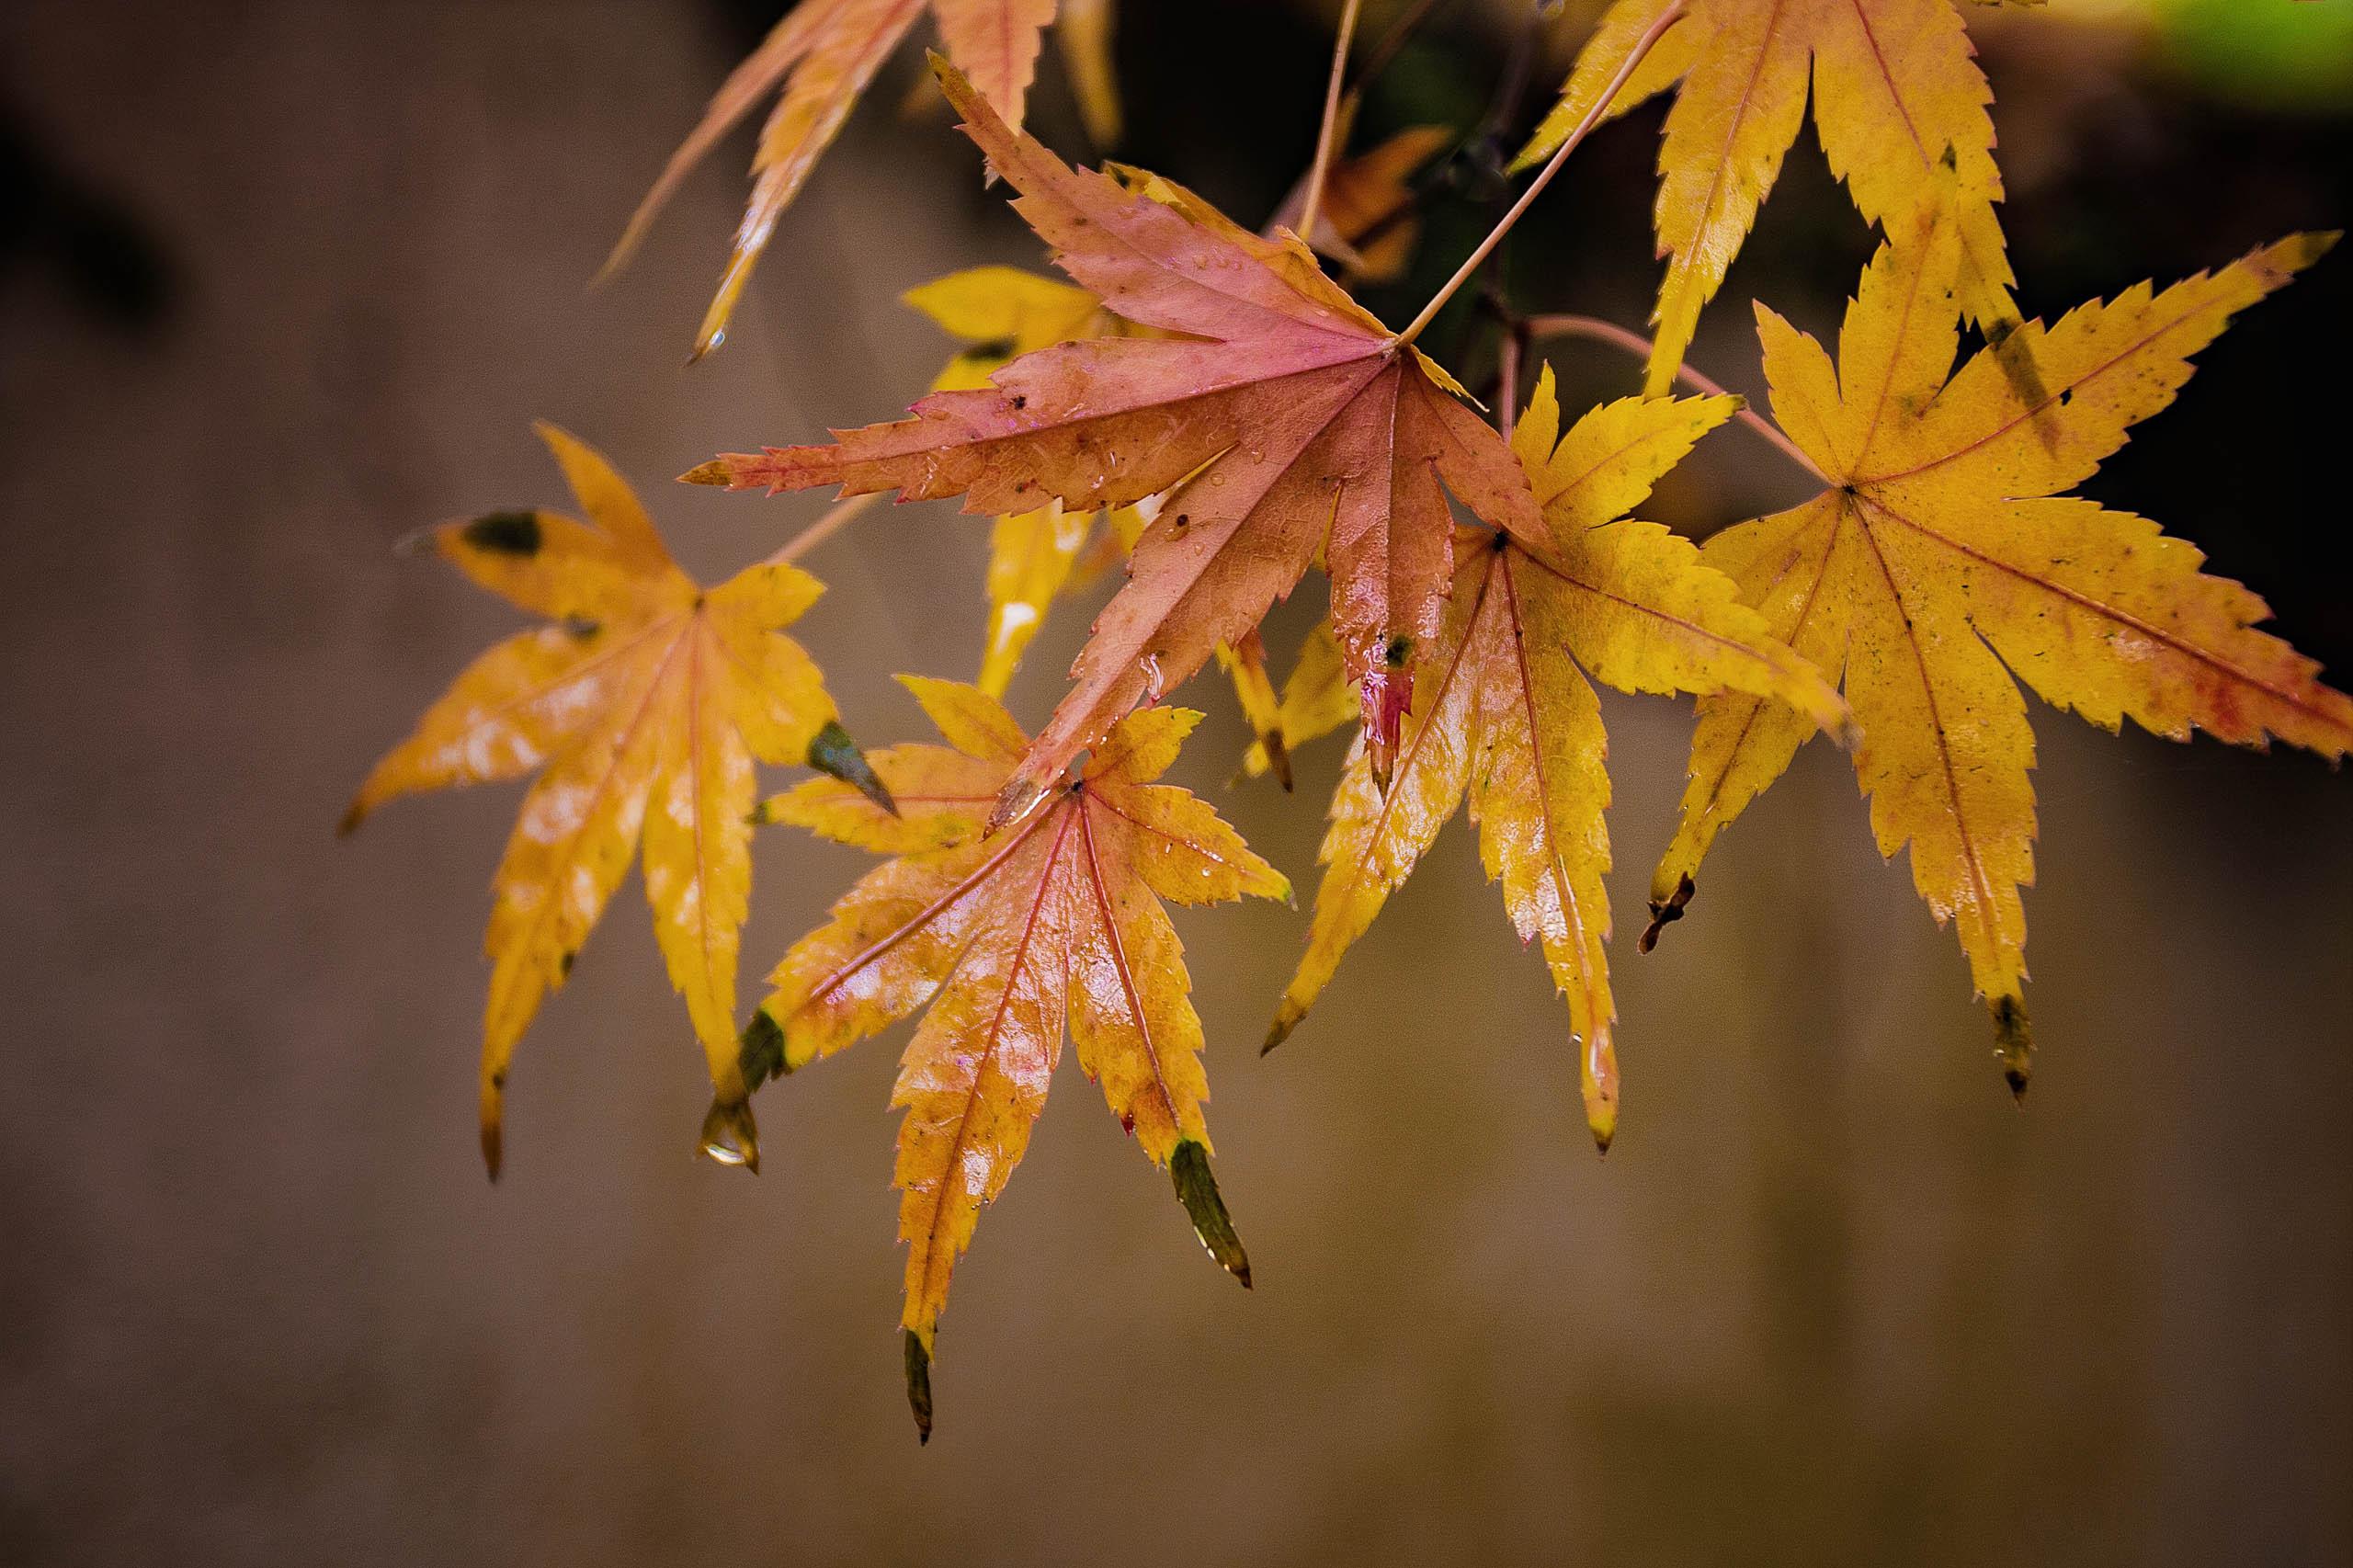 infoautumn road green starting to fall leafs desktop wallpaperhtml 2560x1706